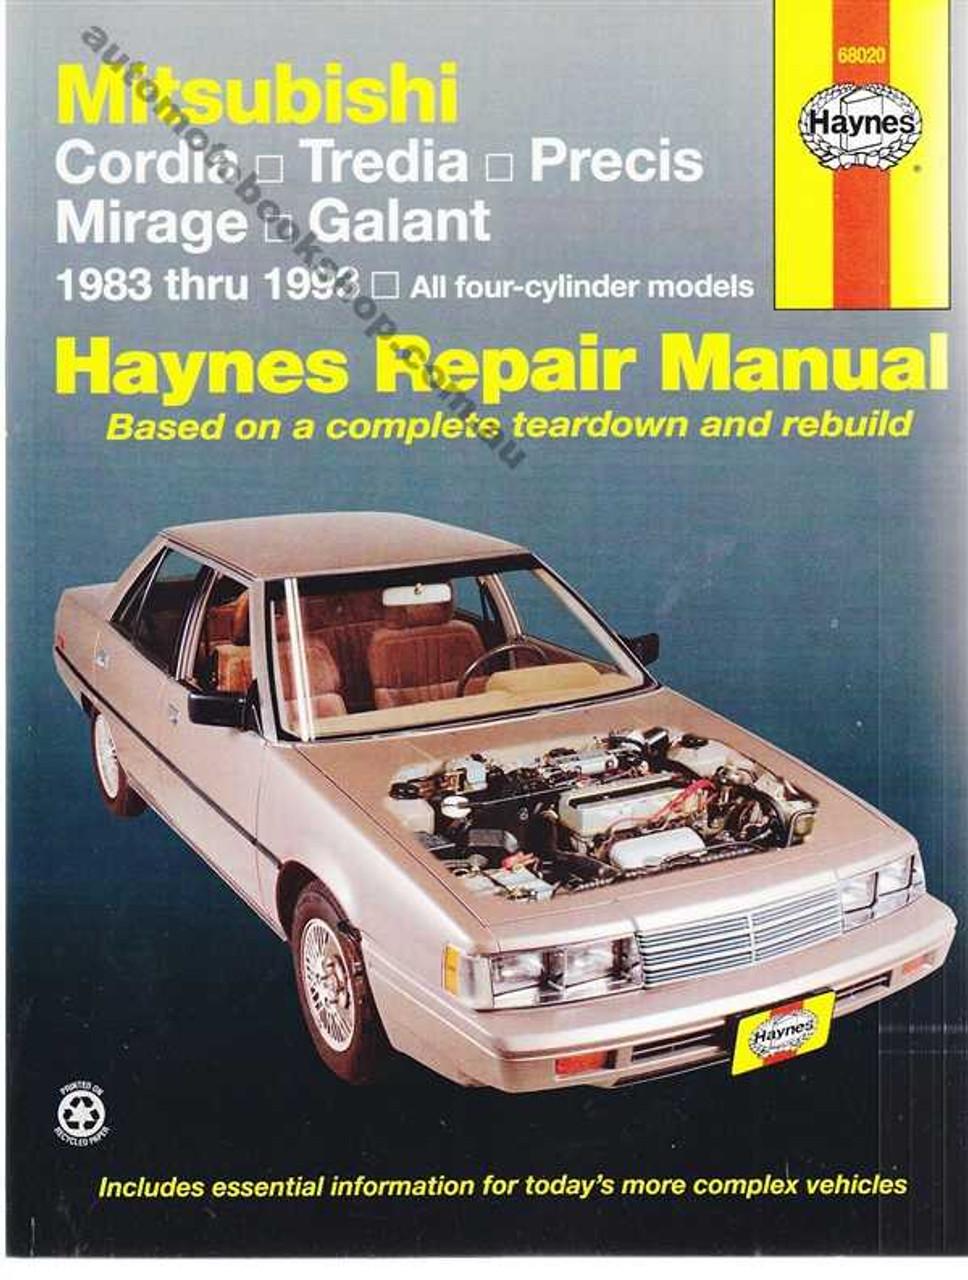 Mitsubishi Cordia Tredia Precis Mirage Galant 1983 1993